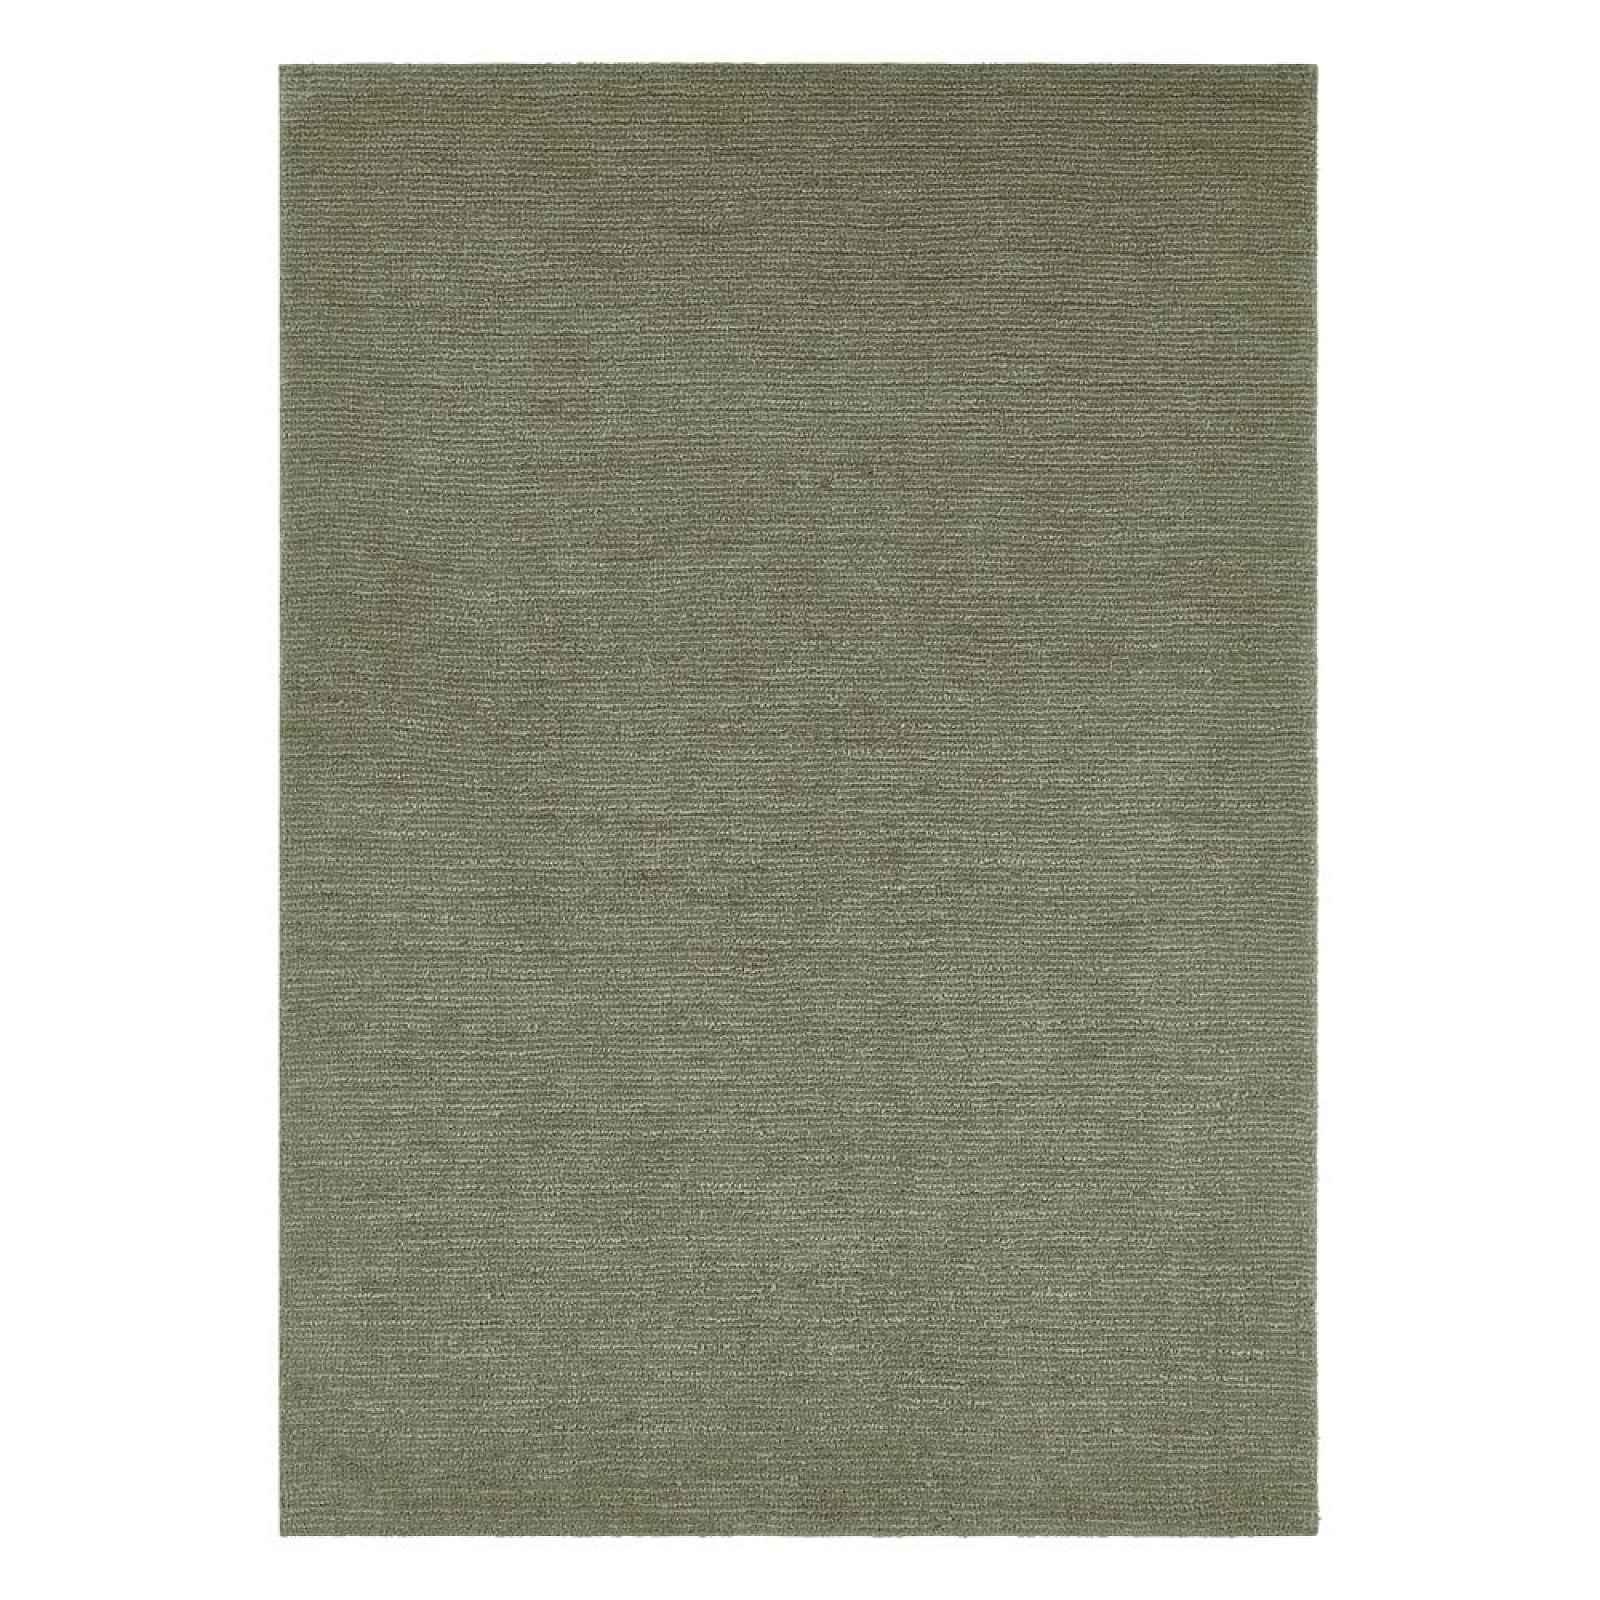 Tmavě zelený koberec Mint Rugs Supersoft, 200 x 290 cm